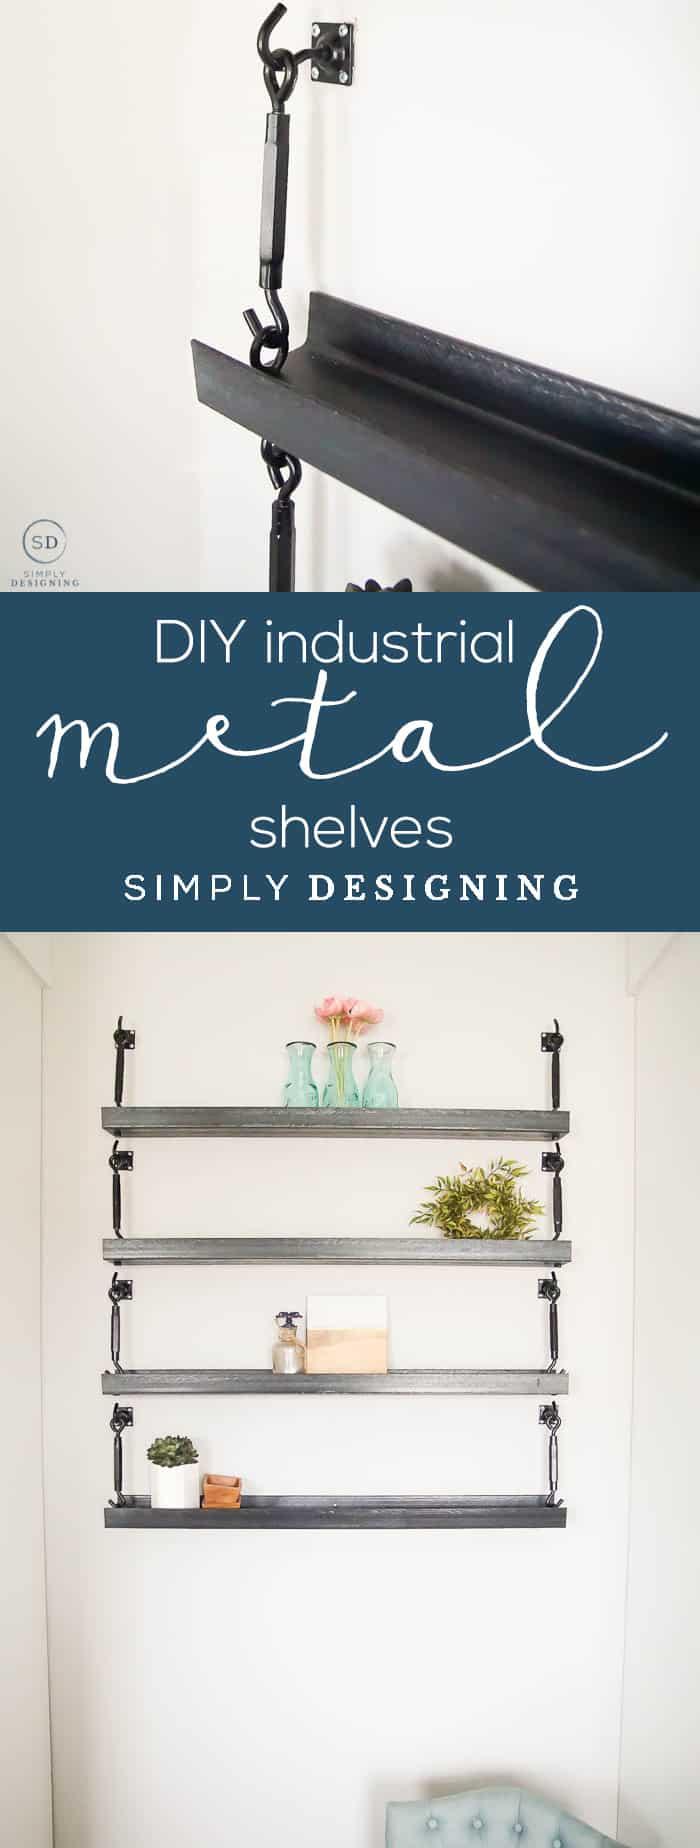 How to Make Industrial Metal Shelves - DIY Industrial Metal Shelves - DIY Metal Shelves